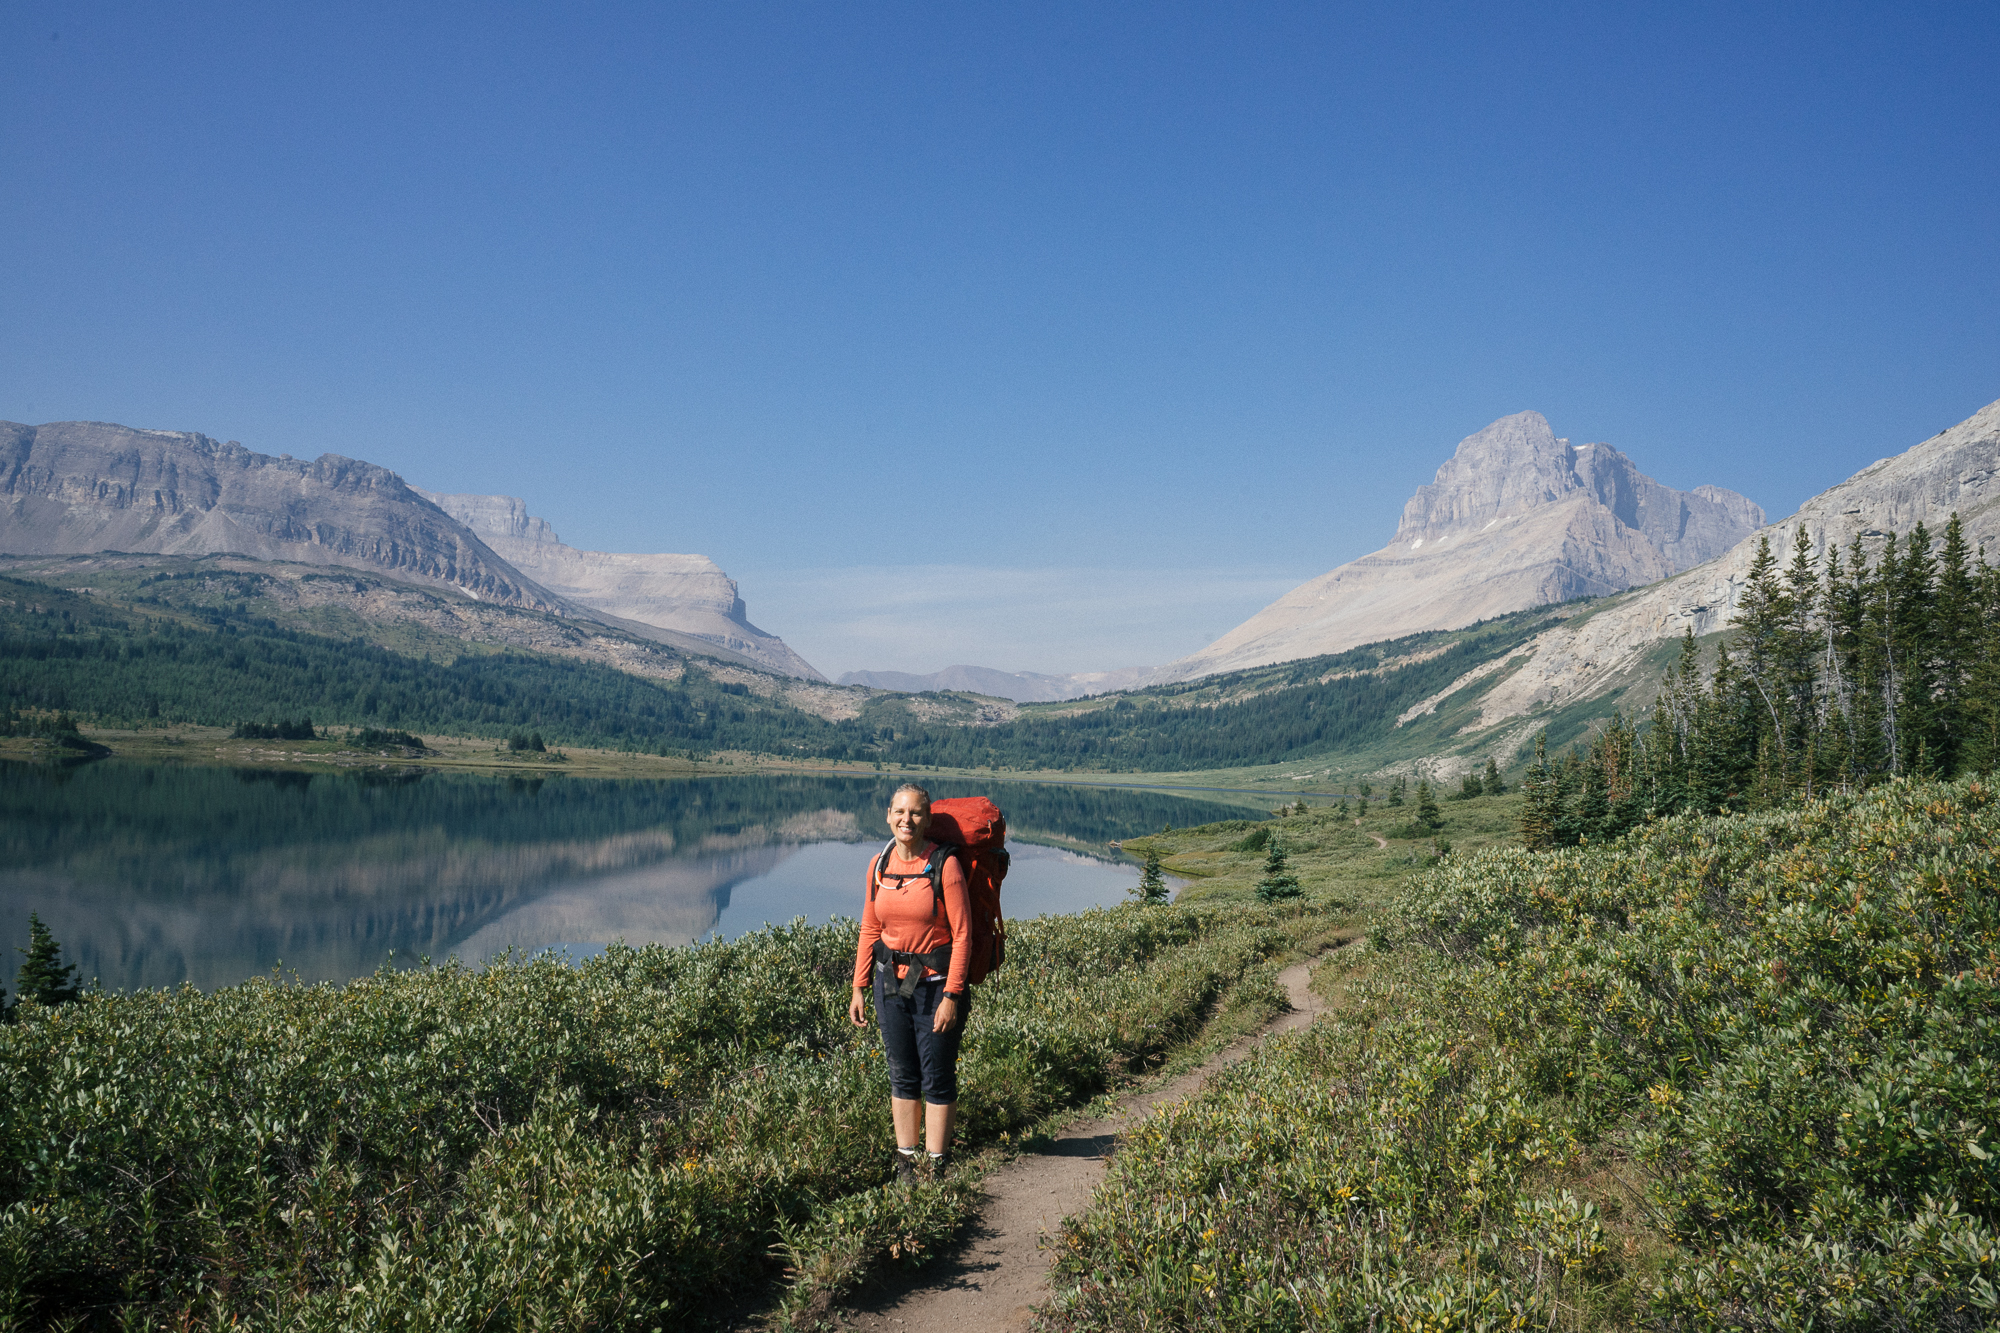 Banff-03594.jpg